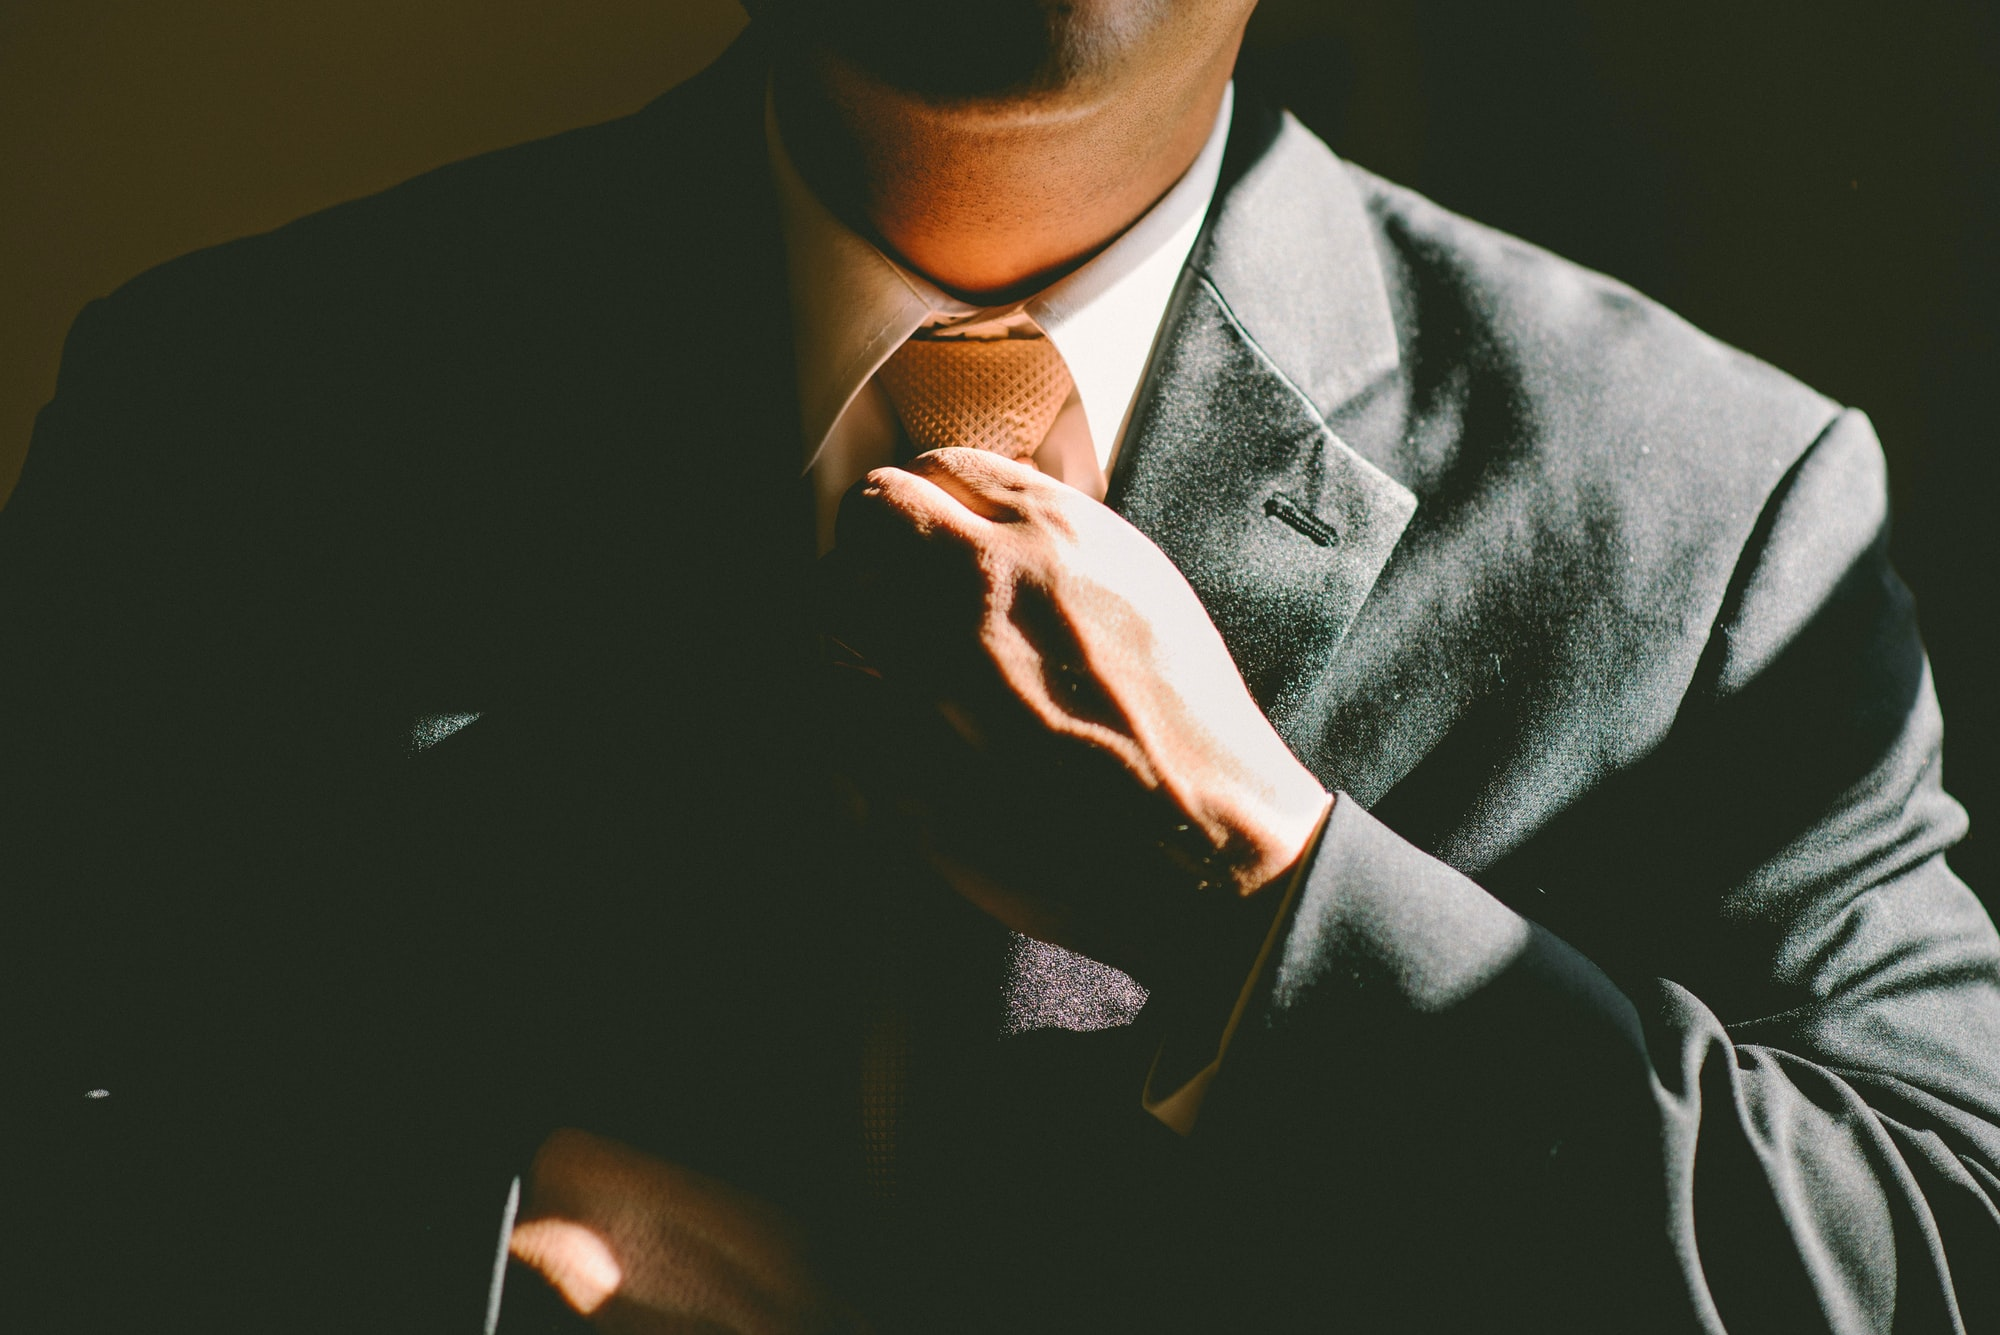 10 Principles of Twenty-First Century Leadership